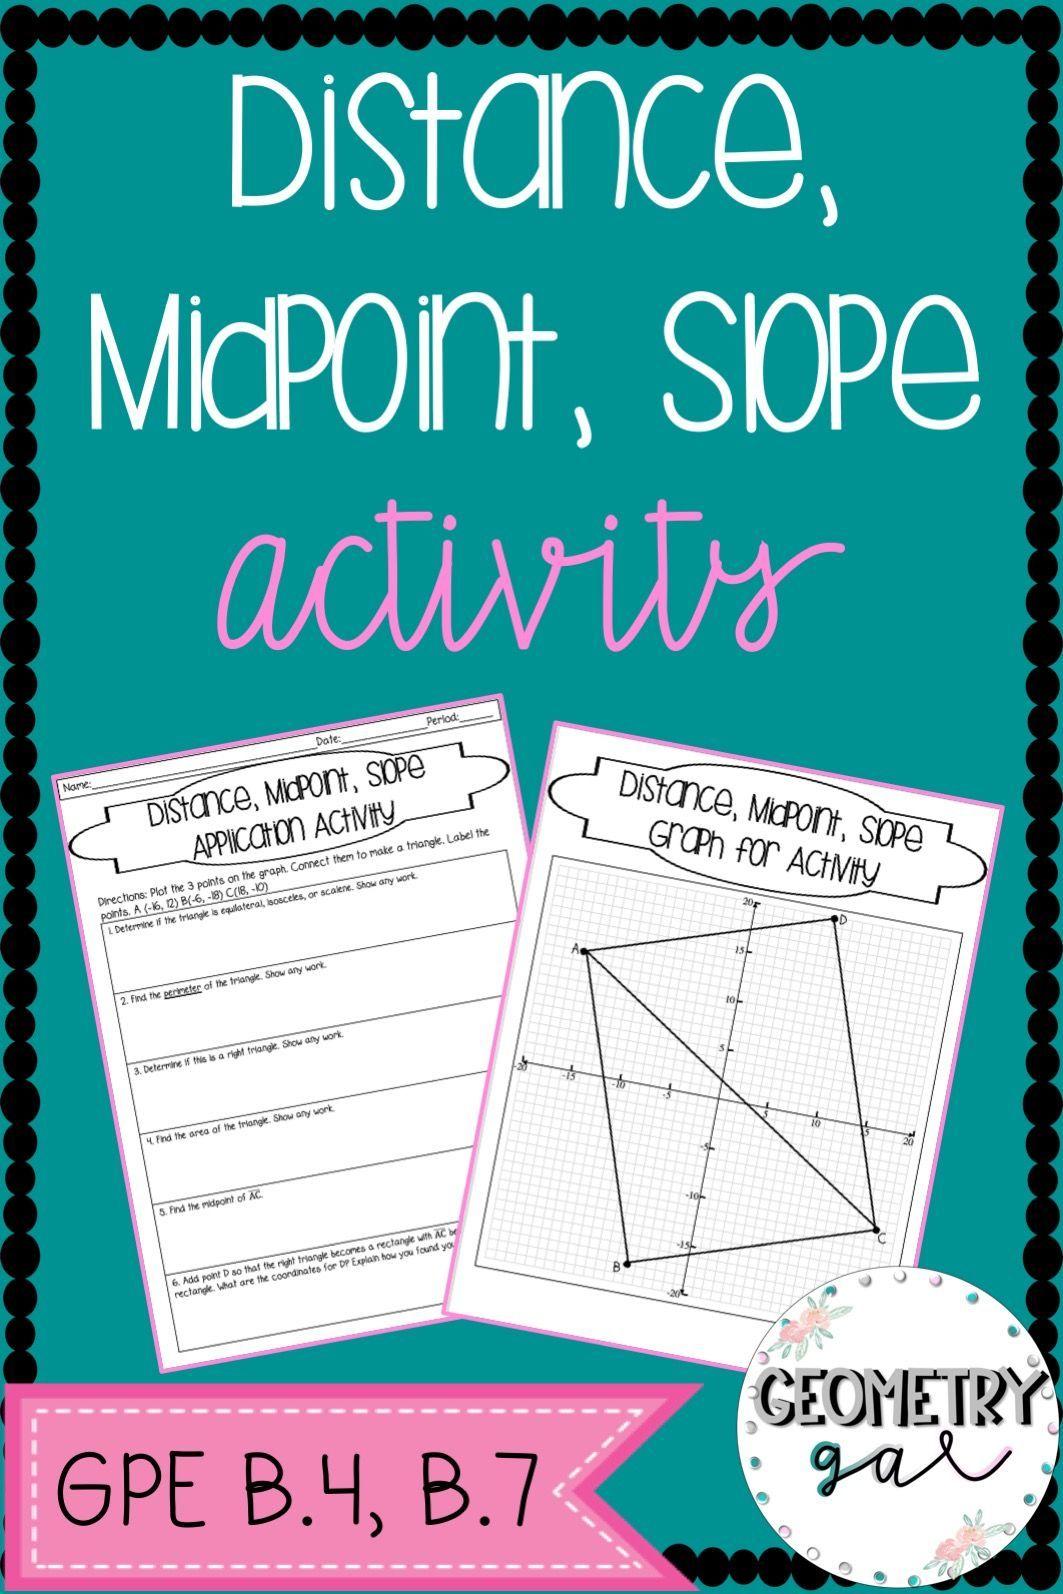 Coordinate Geometry Activity